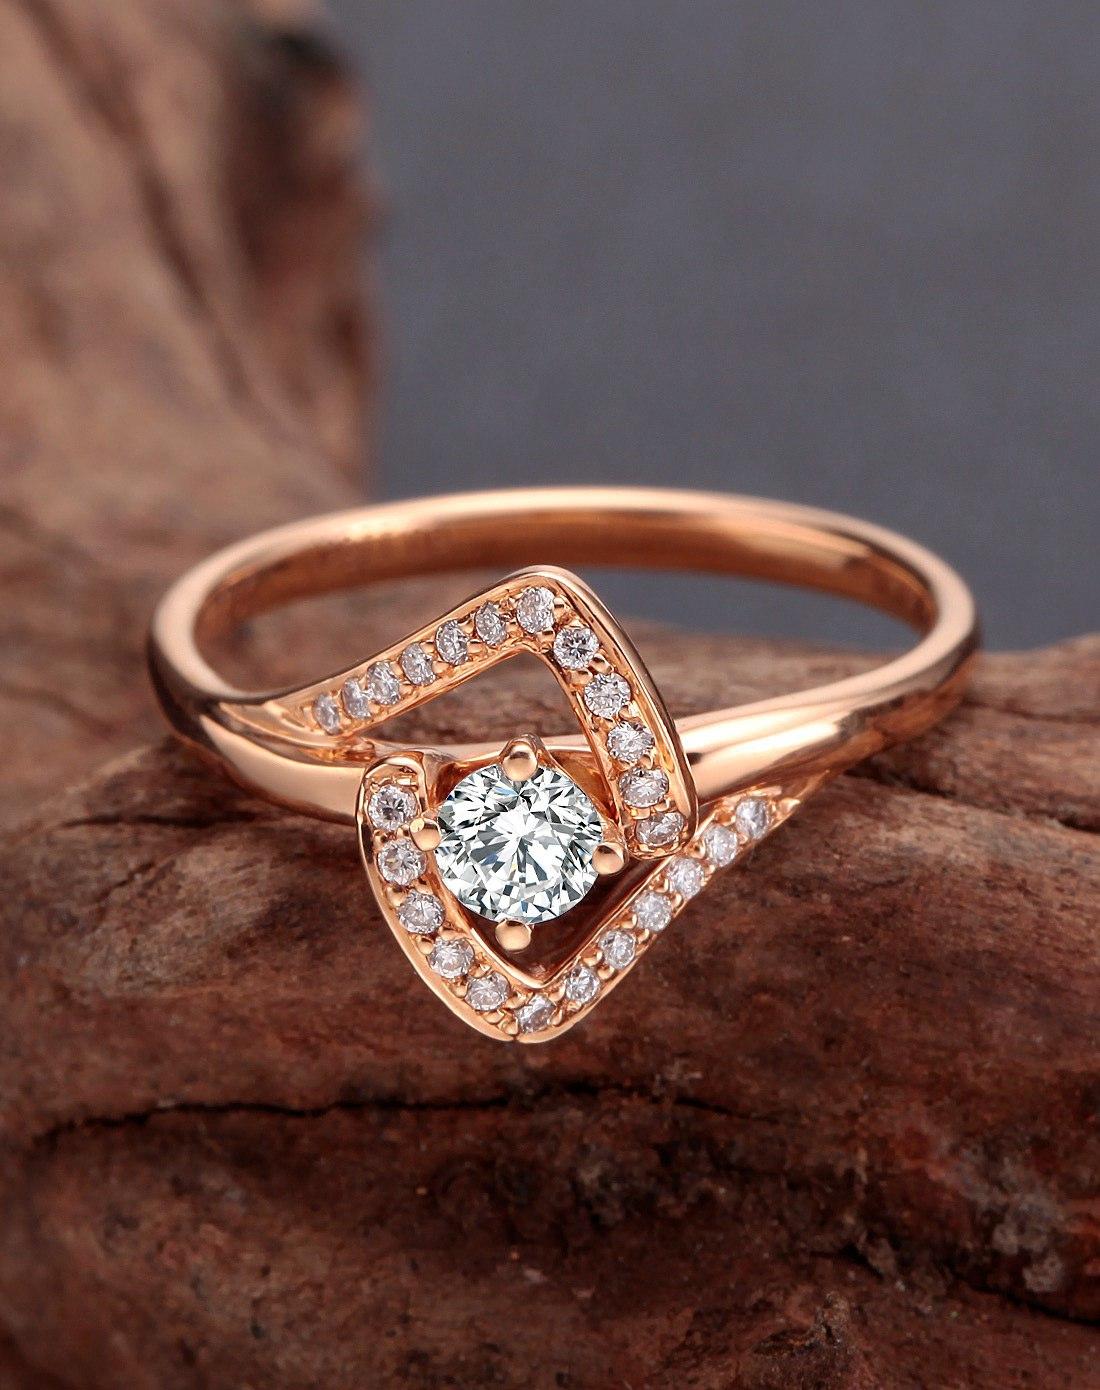 18k玫瑰金钻石戒指拥抱